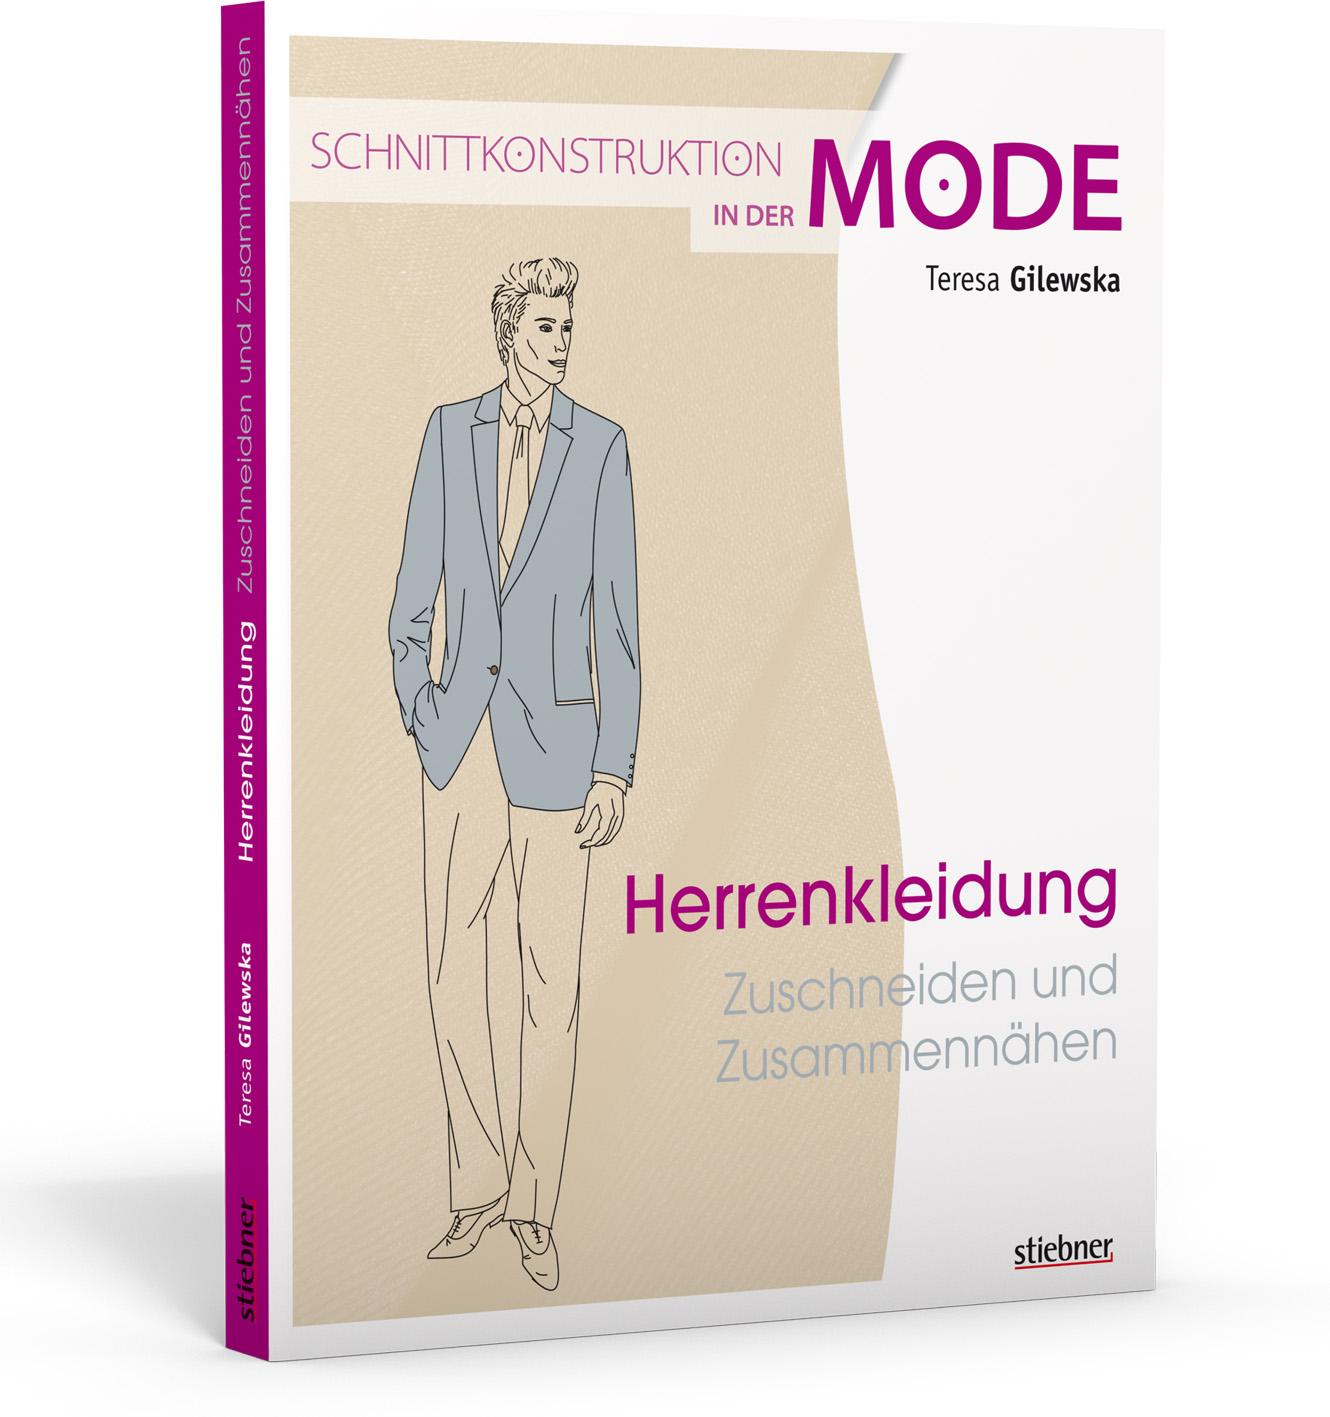 Schnittkonstruktion in der Mode: Herrenkleidung